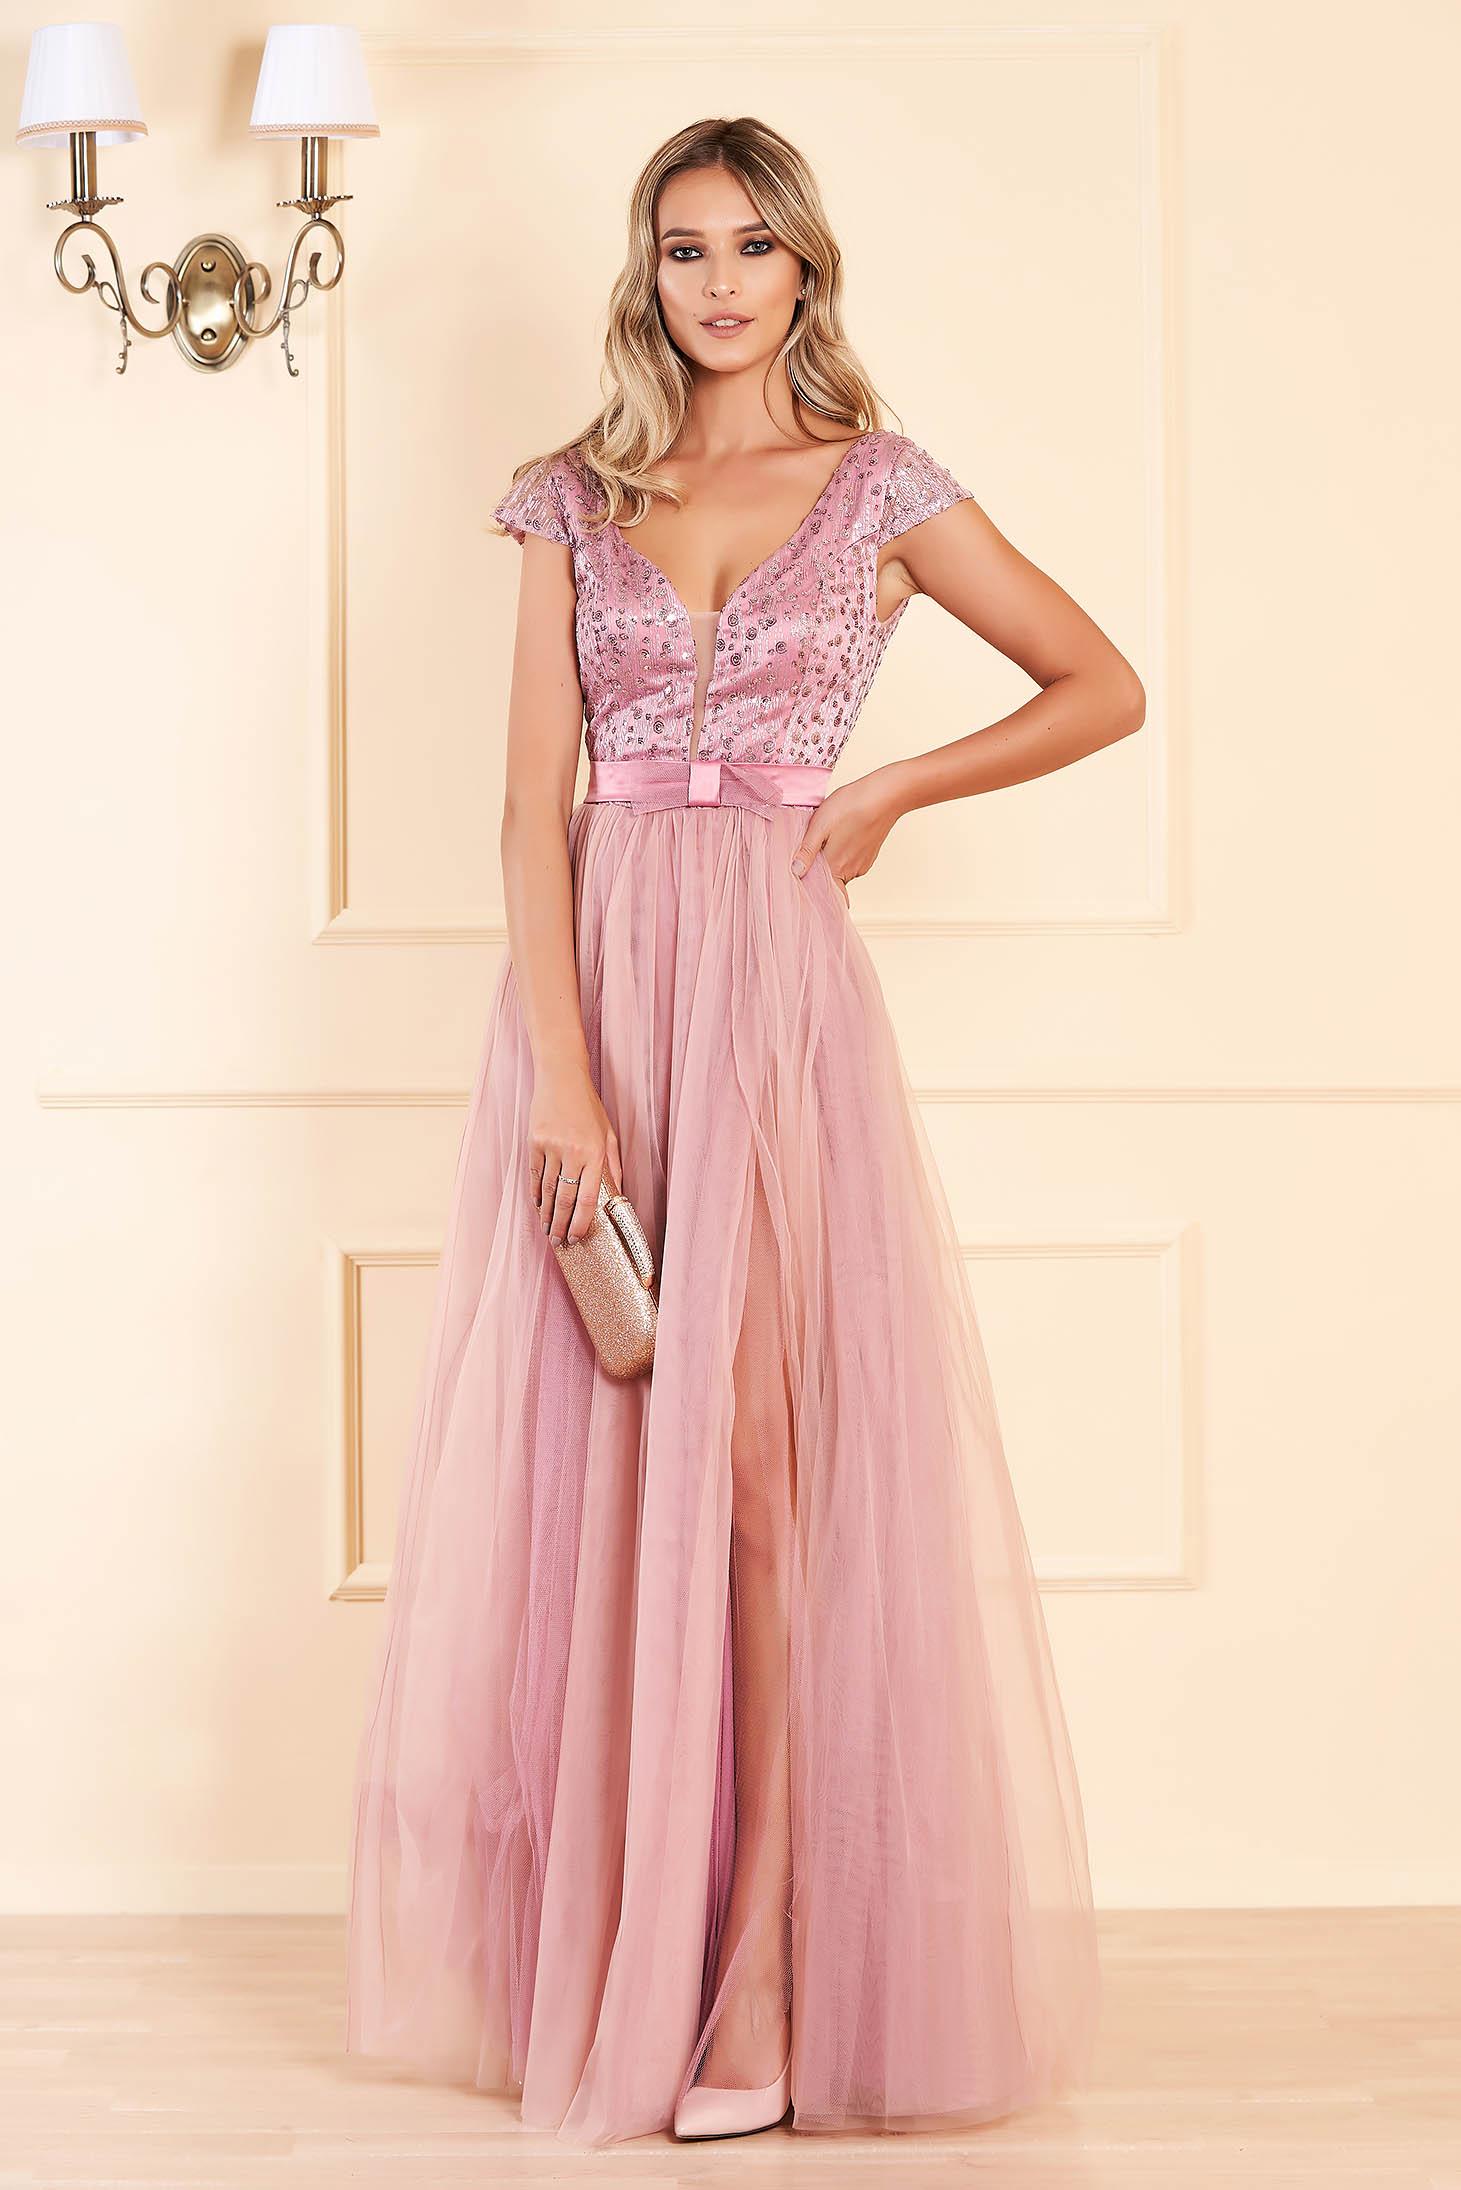 Rochie roz deschis lunga de ocazie in clos cu spatele gol cu bust buretat cu decolteu in v cu aplicatii cu paiete